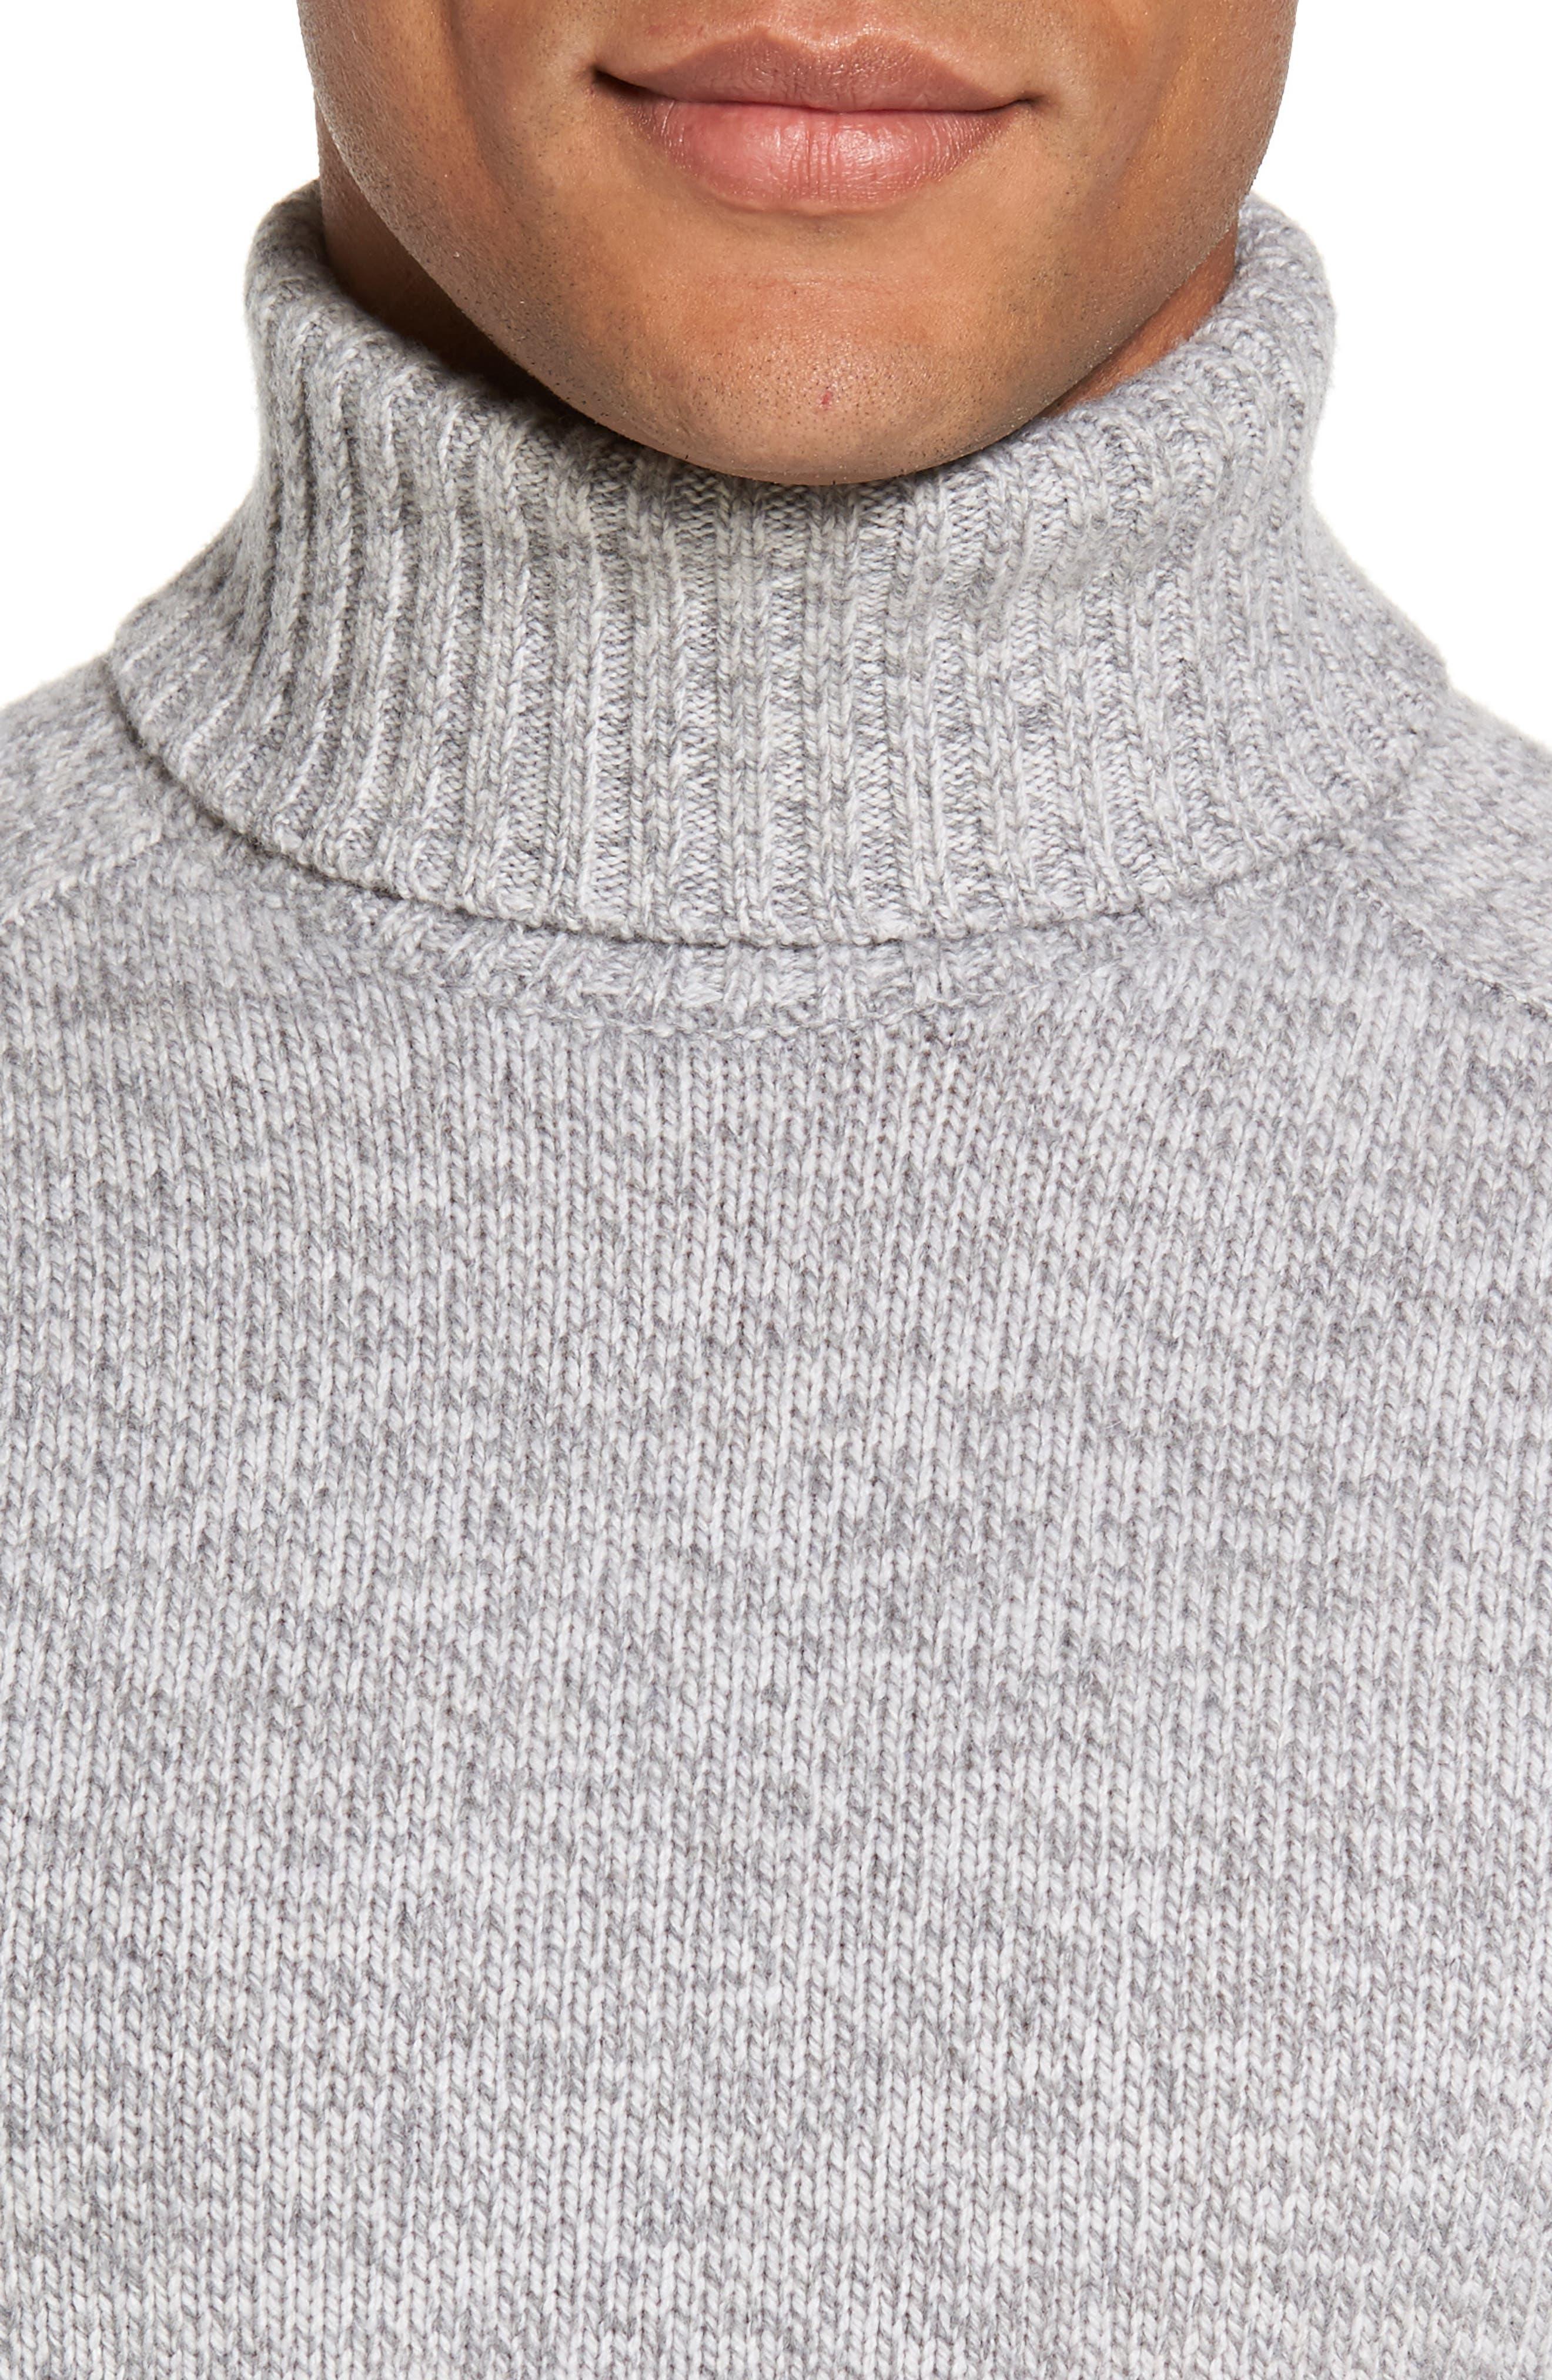 Marled Turtleneck Sweater,                             Alternate thumbnail 4, color,                             054